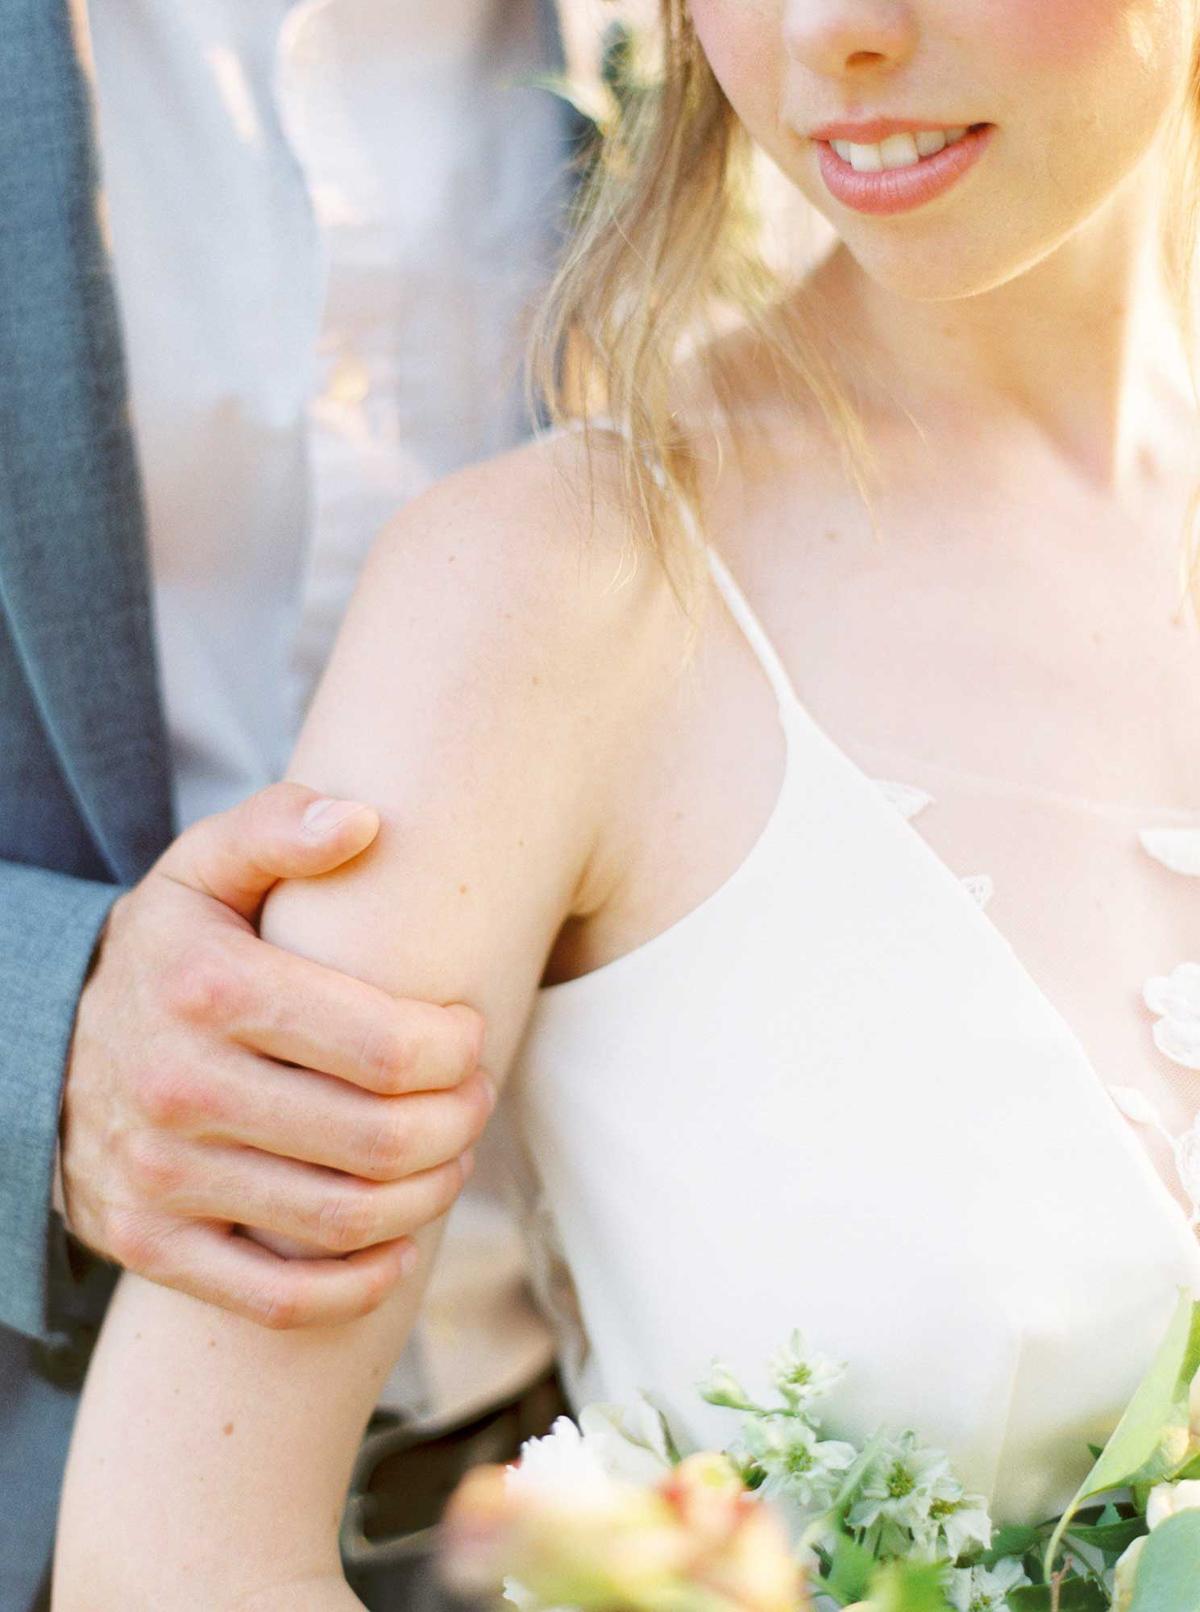 kayla-yestal-vineyard-bride-swish-list-woodland-weddings-niagara-wedding-editorial-26.jpg